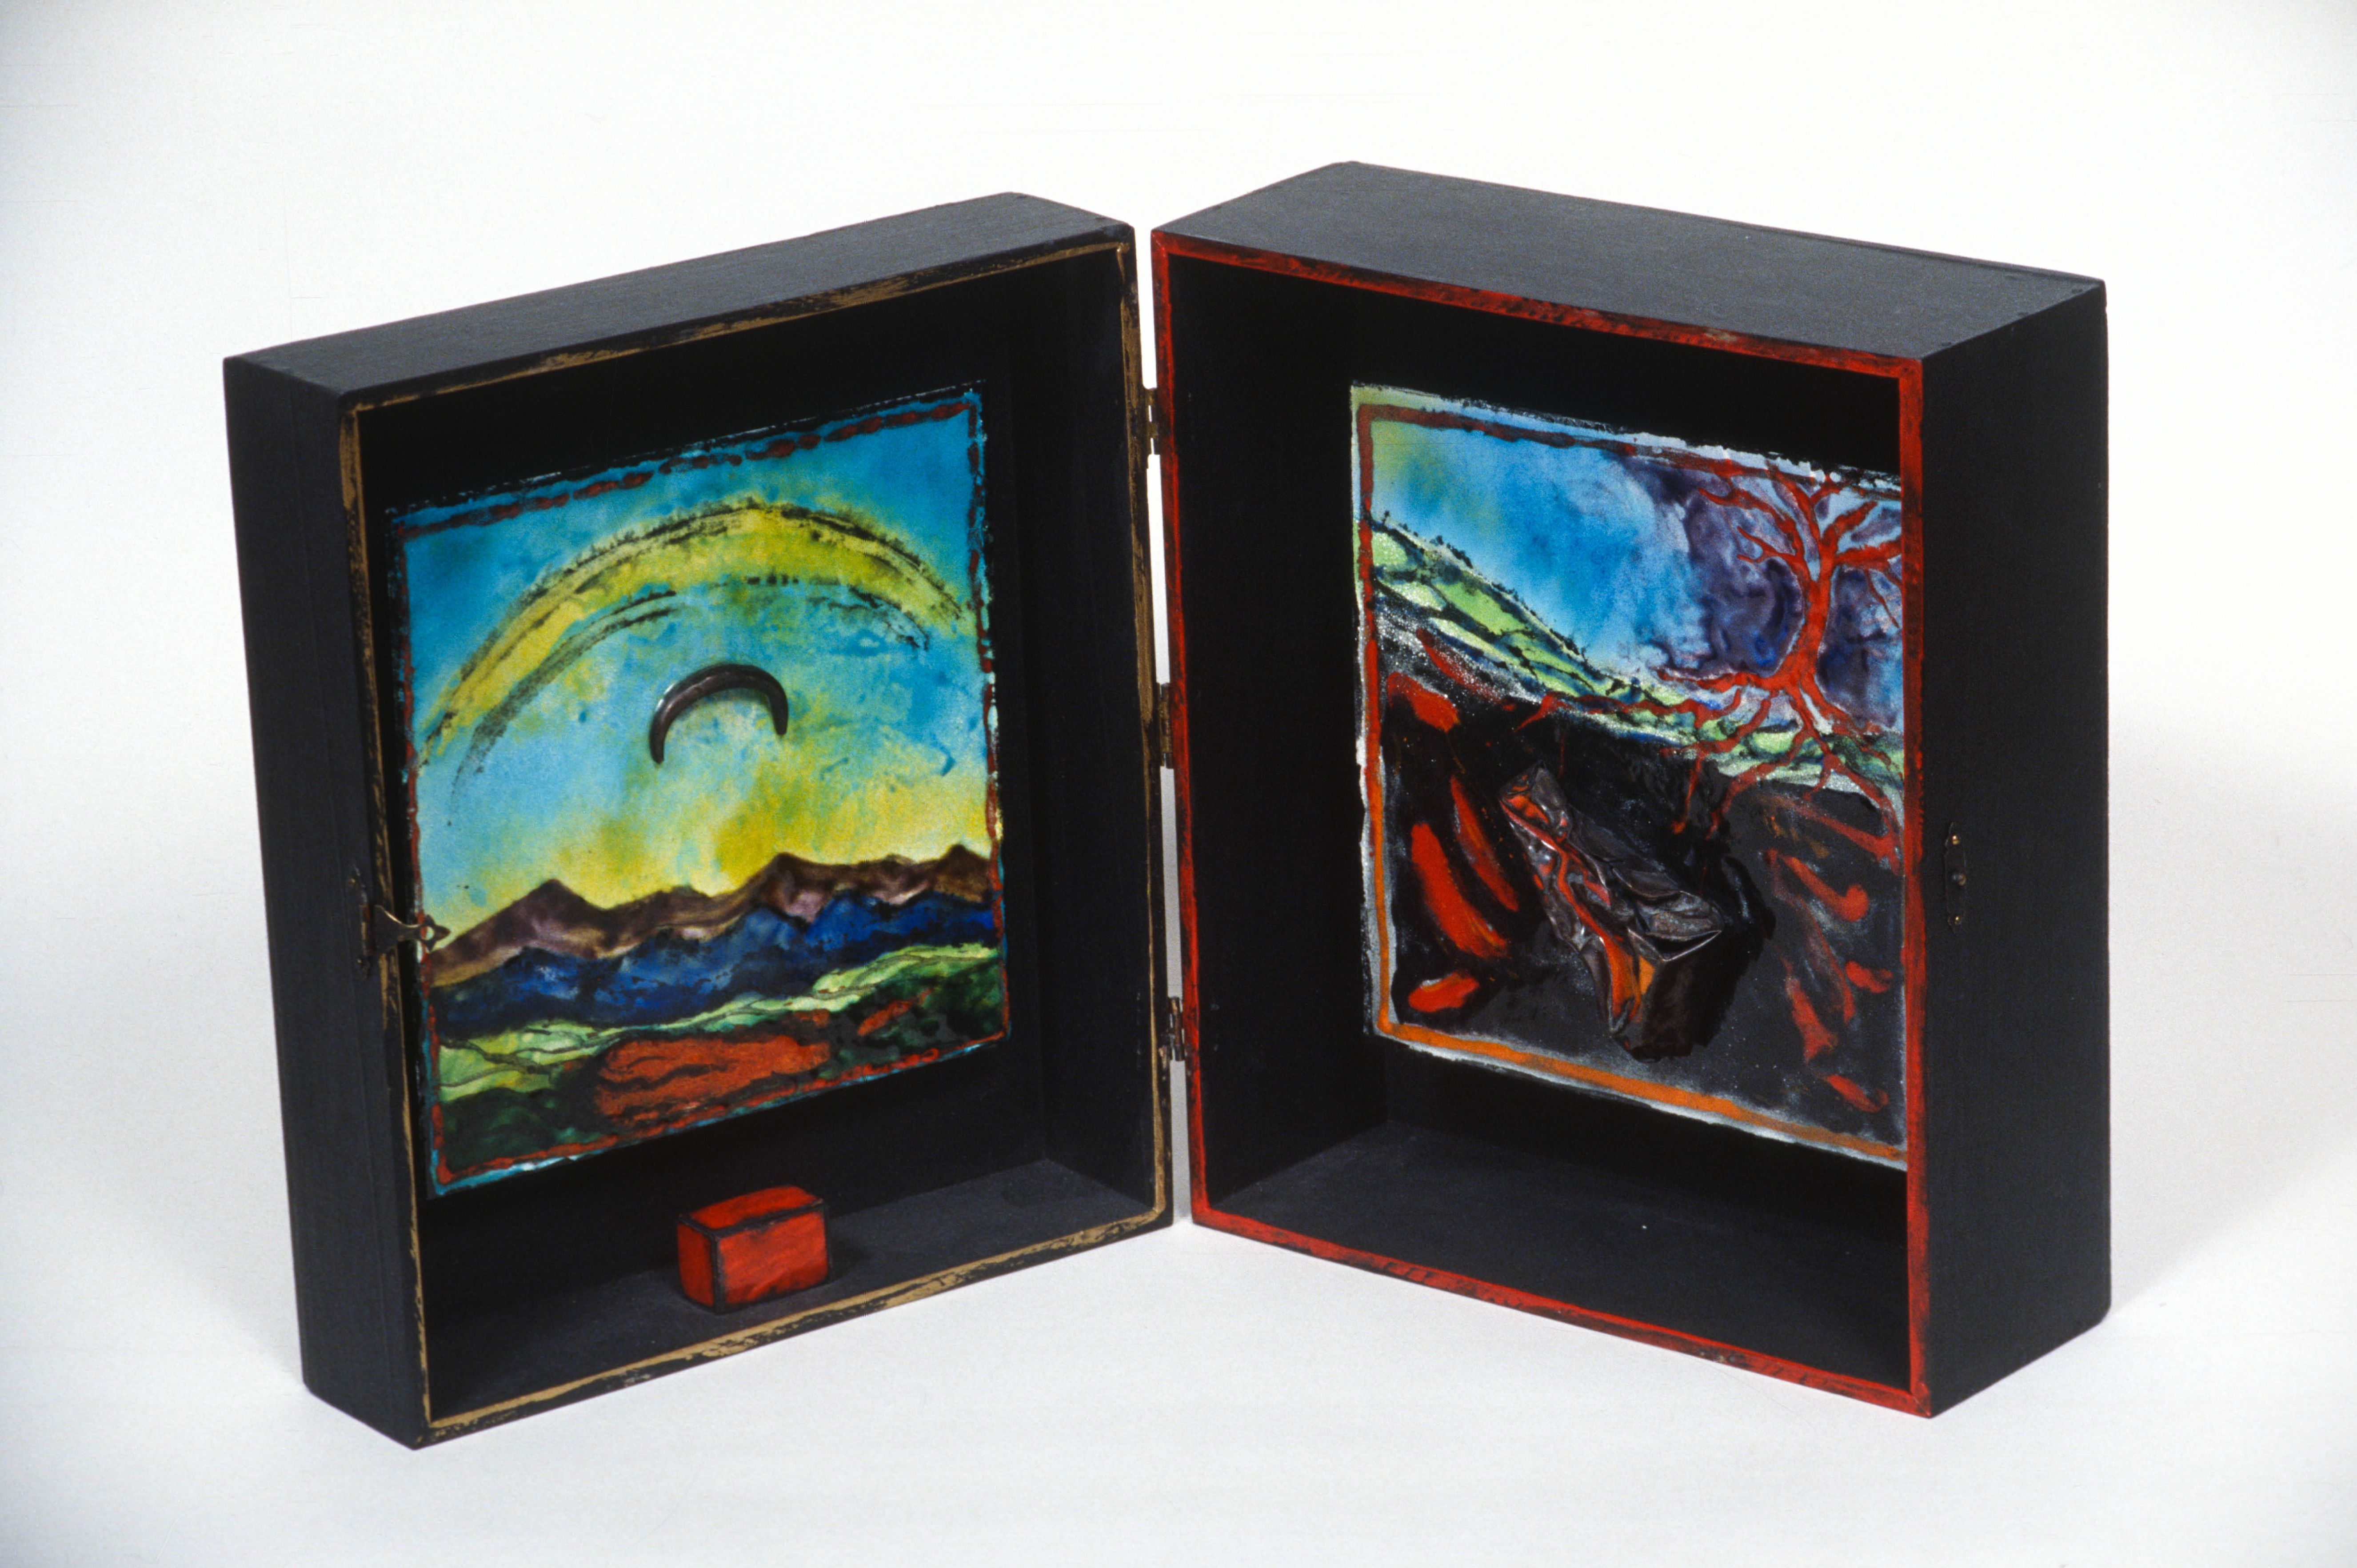 "Landscape Box Enamel on steel and mixed media 10"" x 10"" x 5"" 1996"